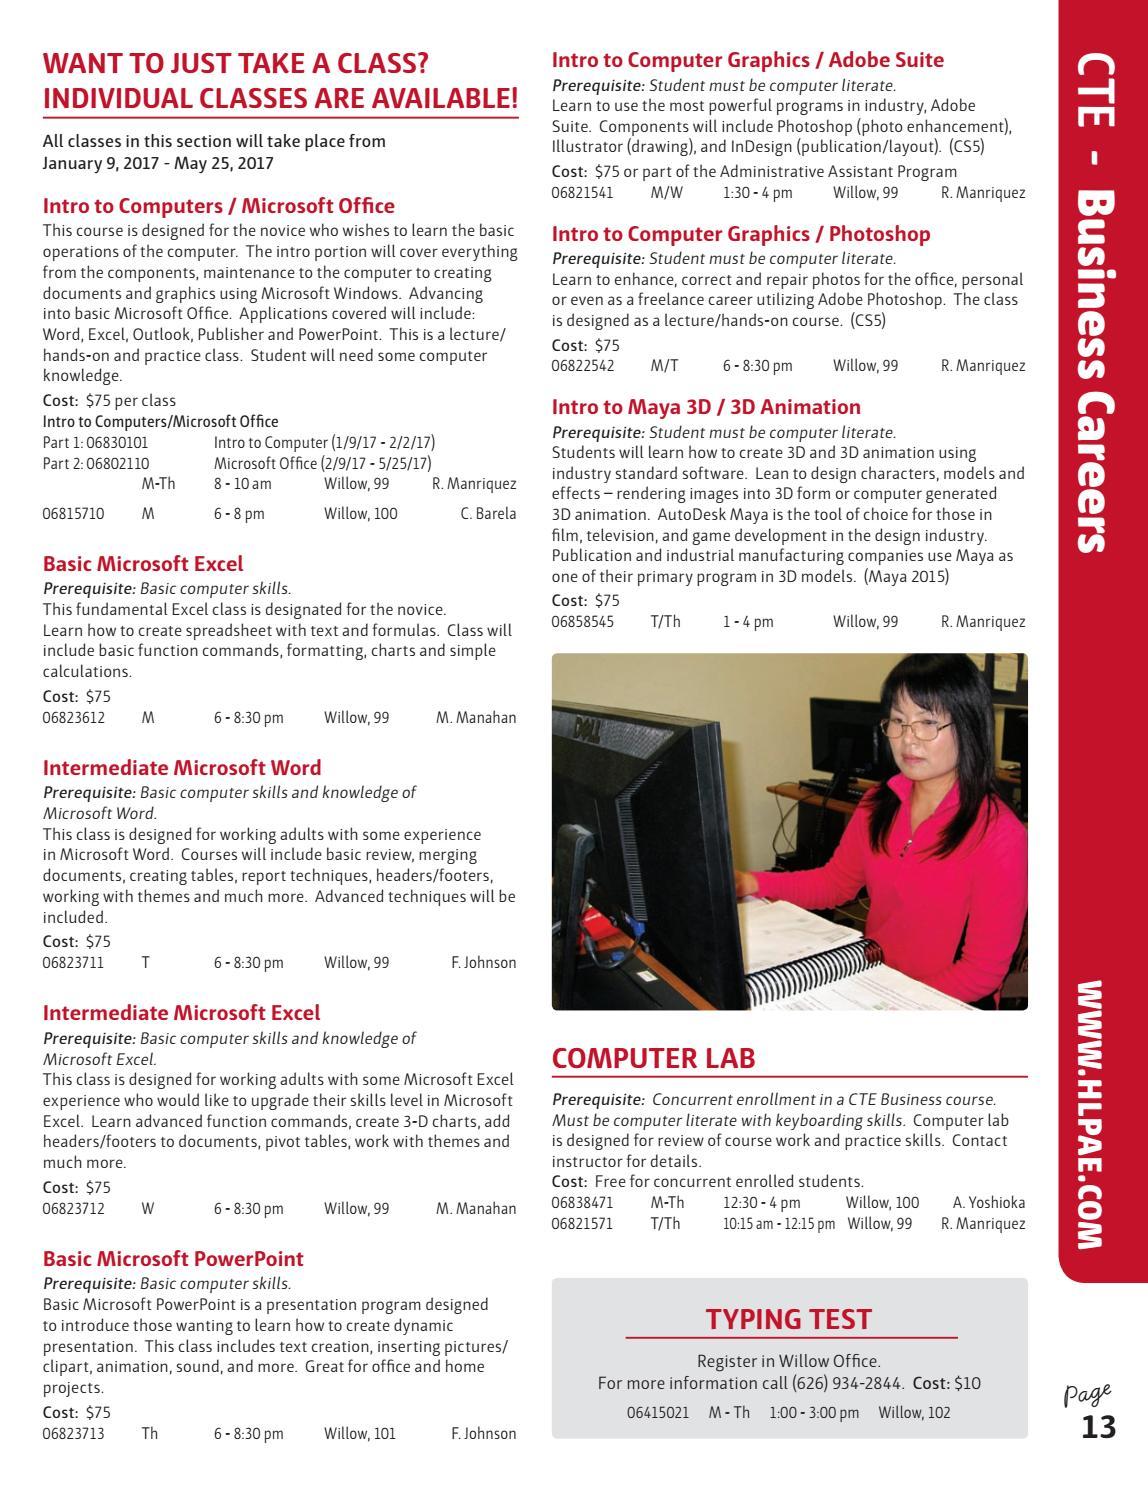 hacienda la puente adult education spring 2017 catalog by q press issuu - Sound Computer Skills